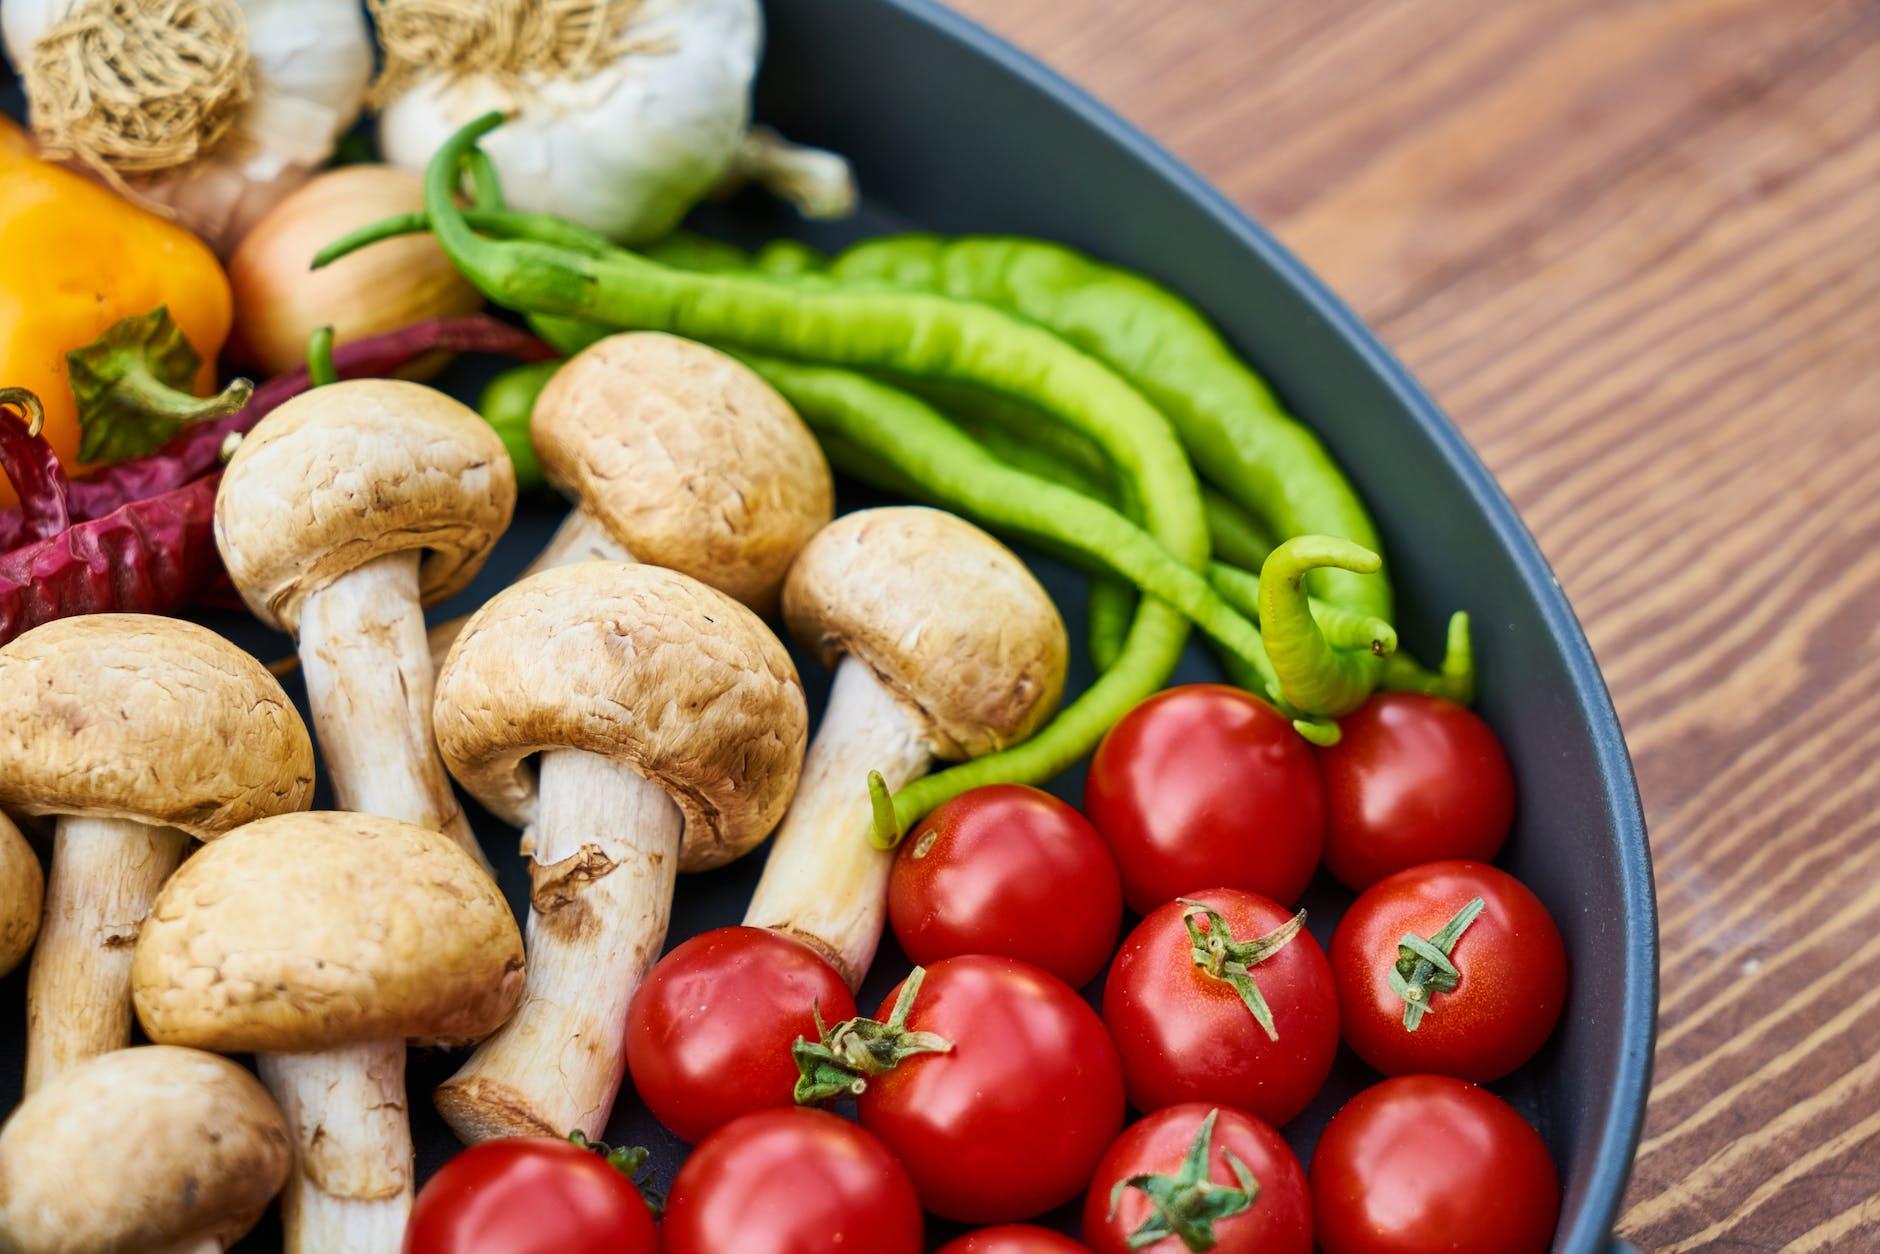 Enjoy Your Mushroom Harvest | How To Grow Mushrooms At Home | Garden Season Guide